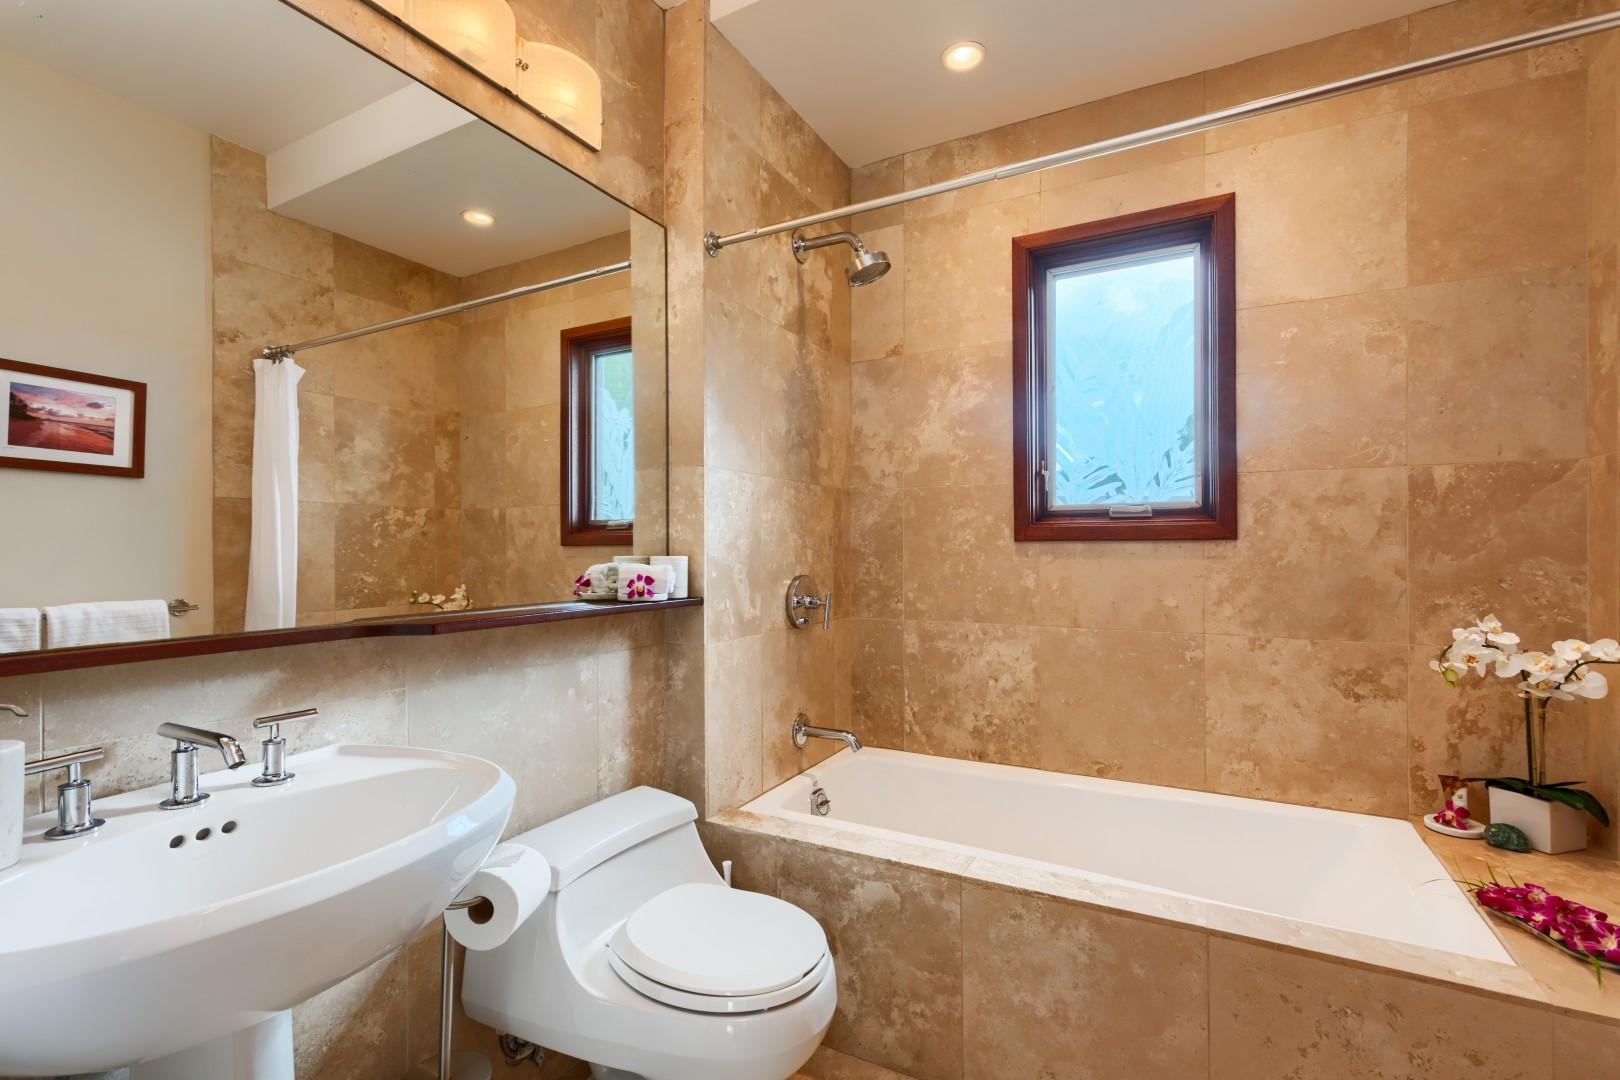 Second floor hallway bathroom for queen bedroom and house use.